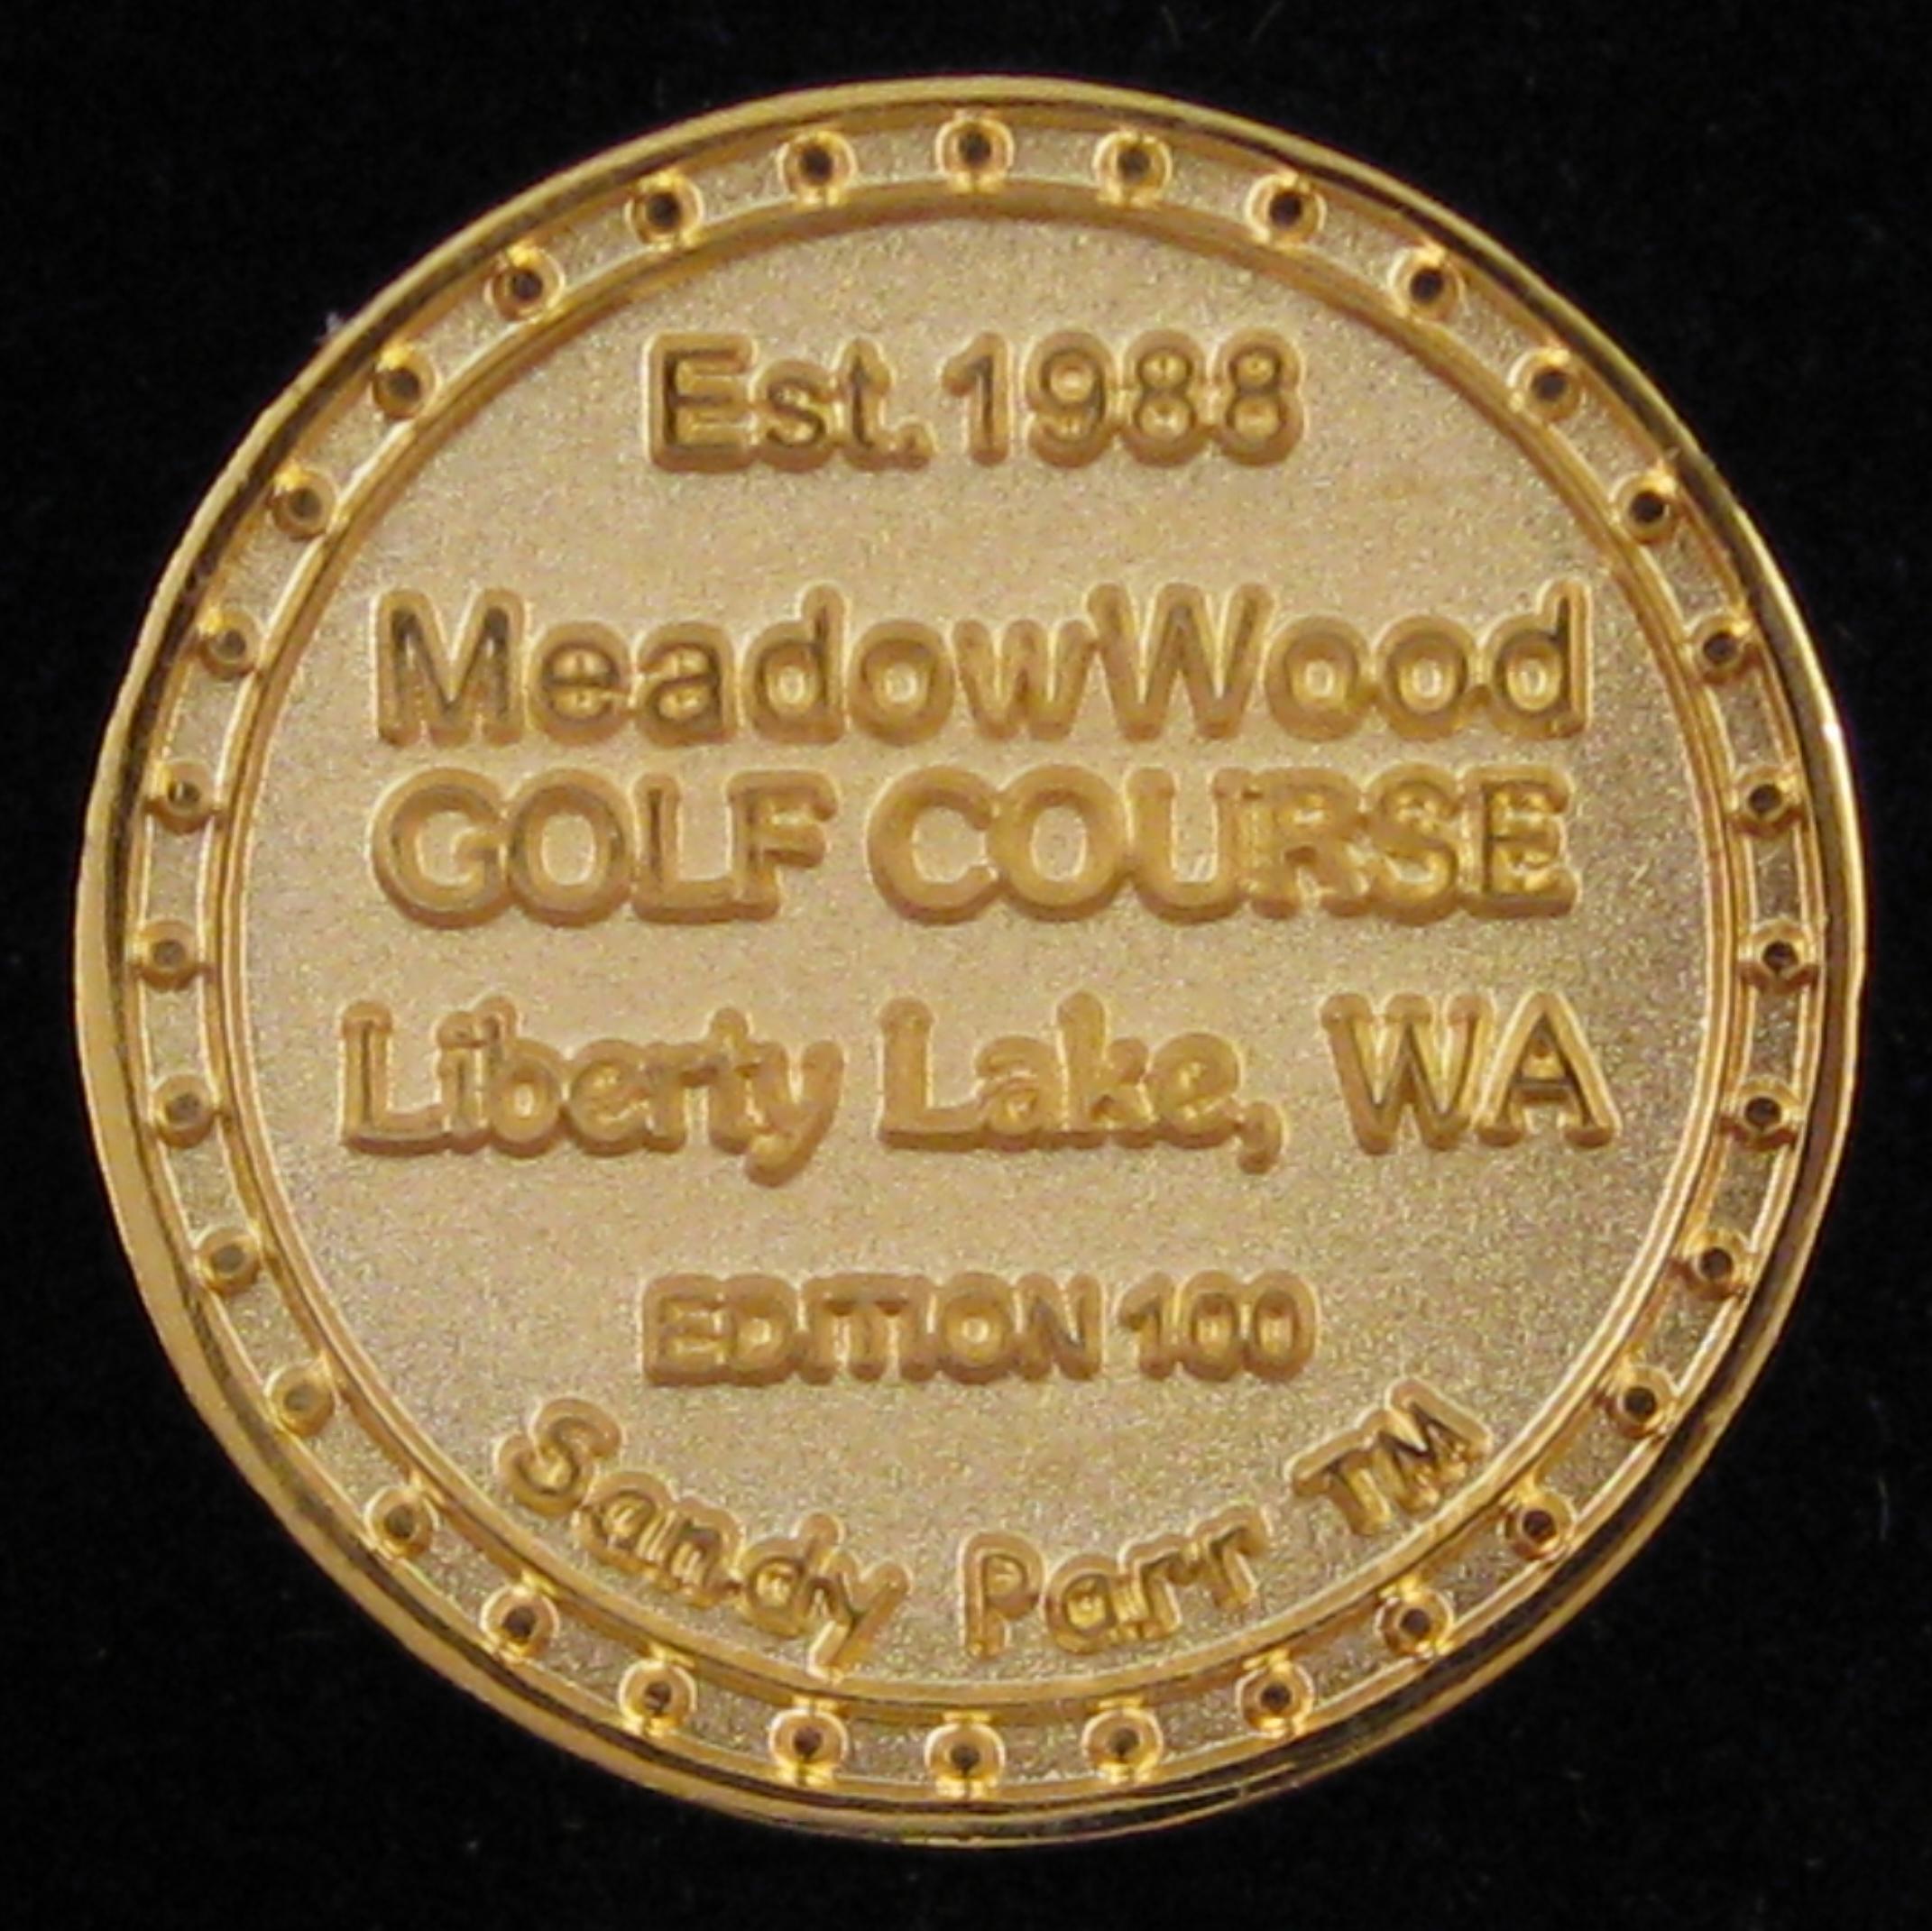 Meadow Wood G.C. - Back